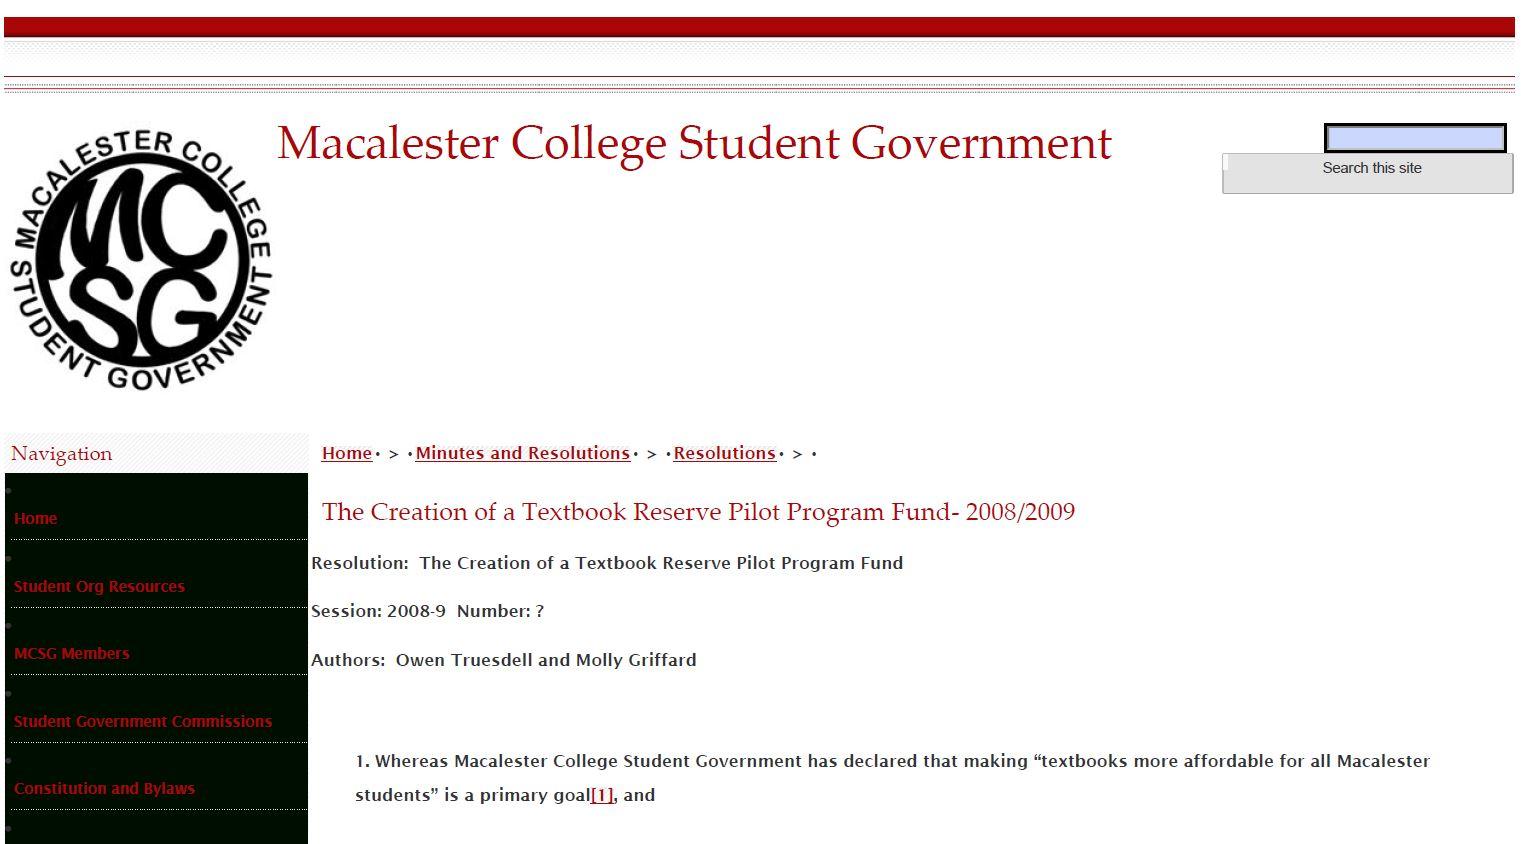 Creation of Textbook Reserve Pilot Program Fund